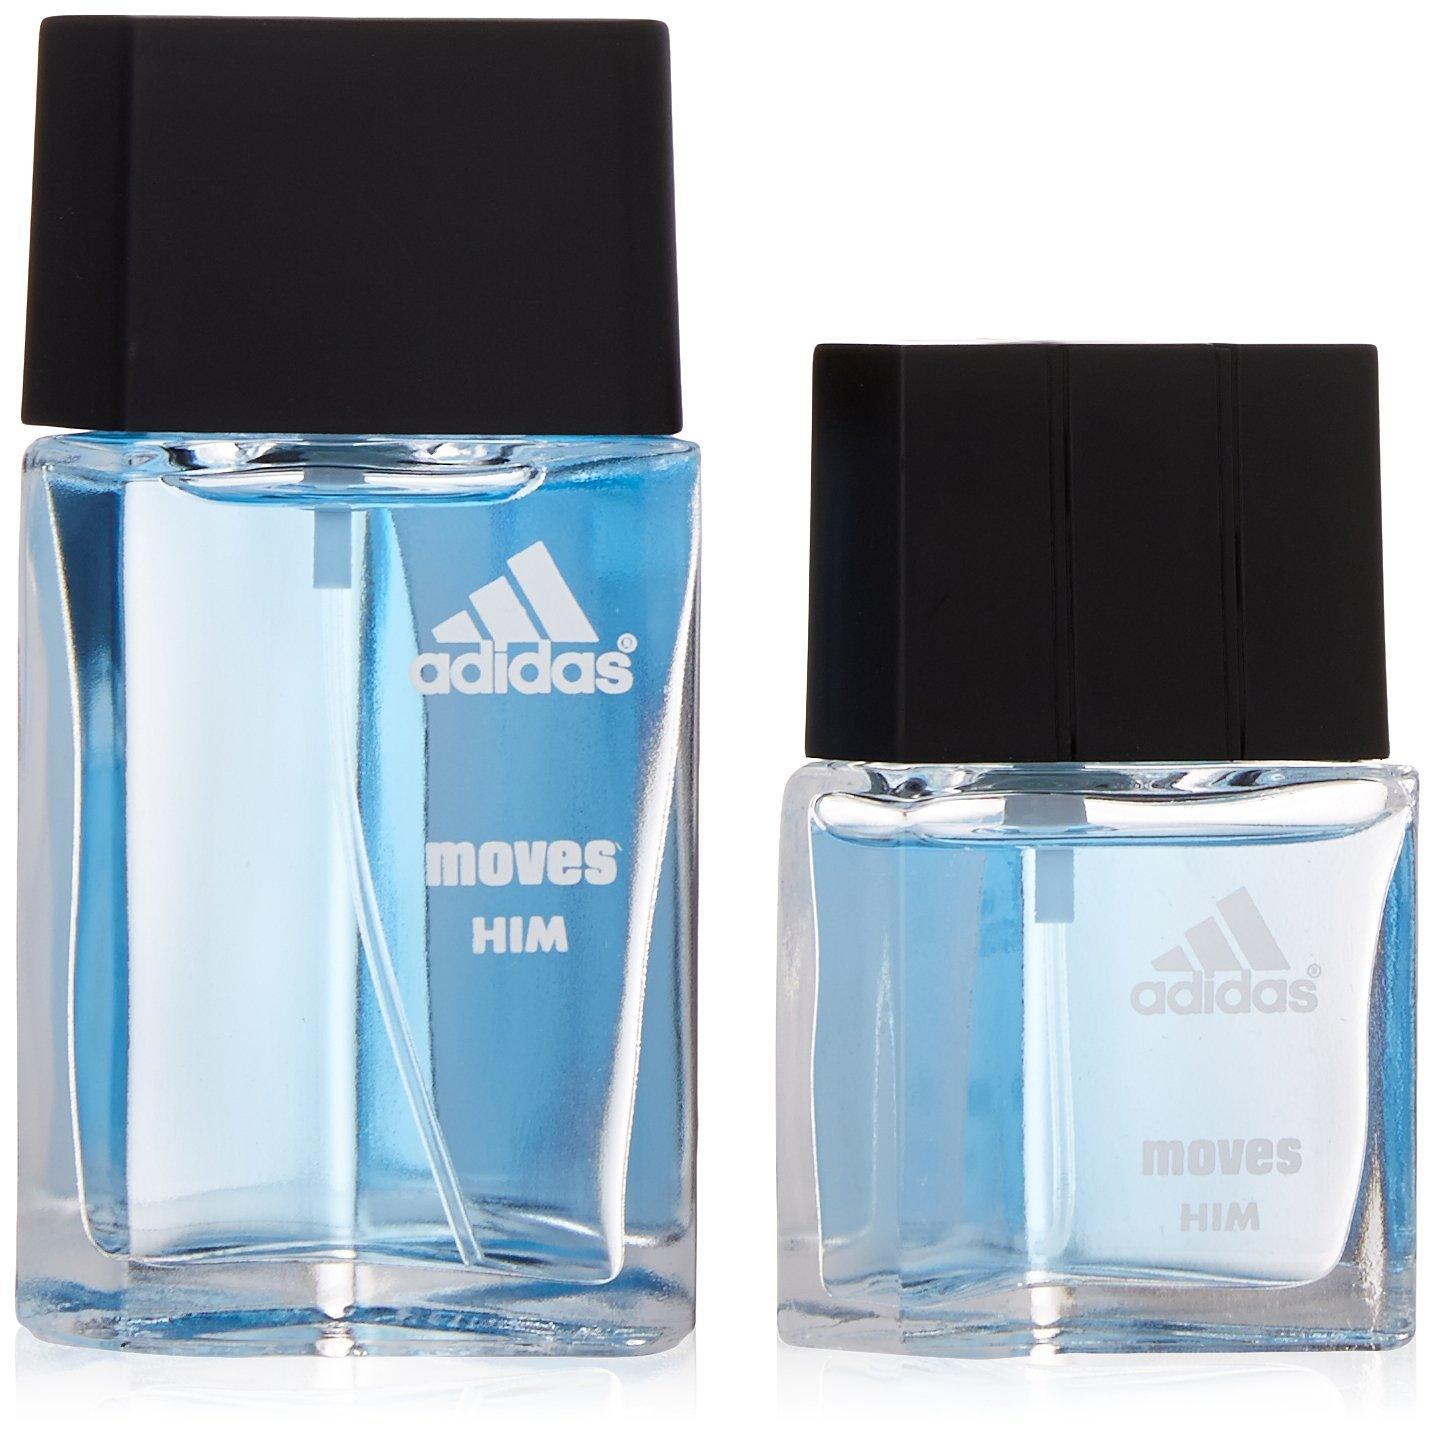 Adidas Moves By Adidas For Men. Gift Set ( Eau De Toilette Spray 1.0 Oz + Eau De Toilette Spray 0.5 Oz ) by adidas